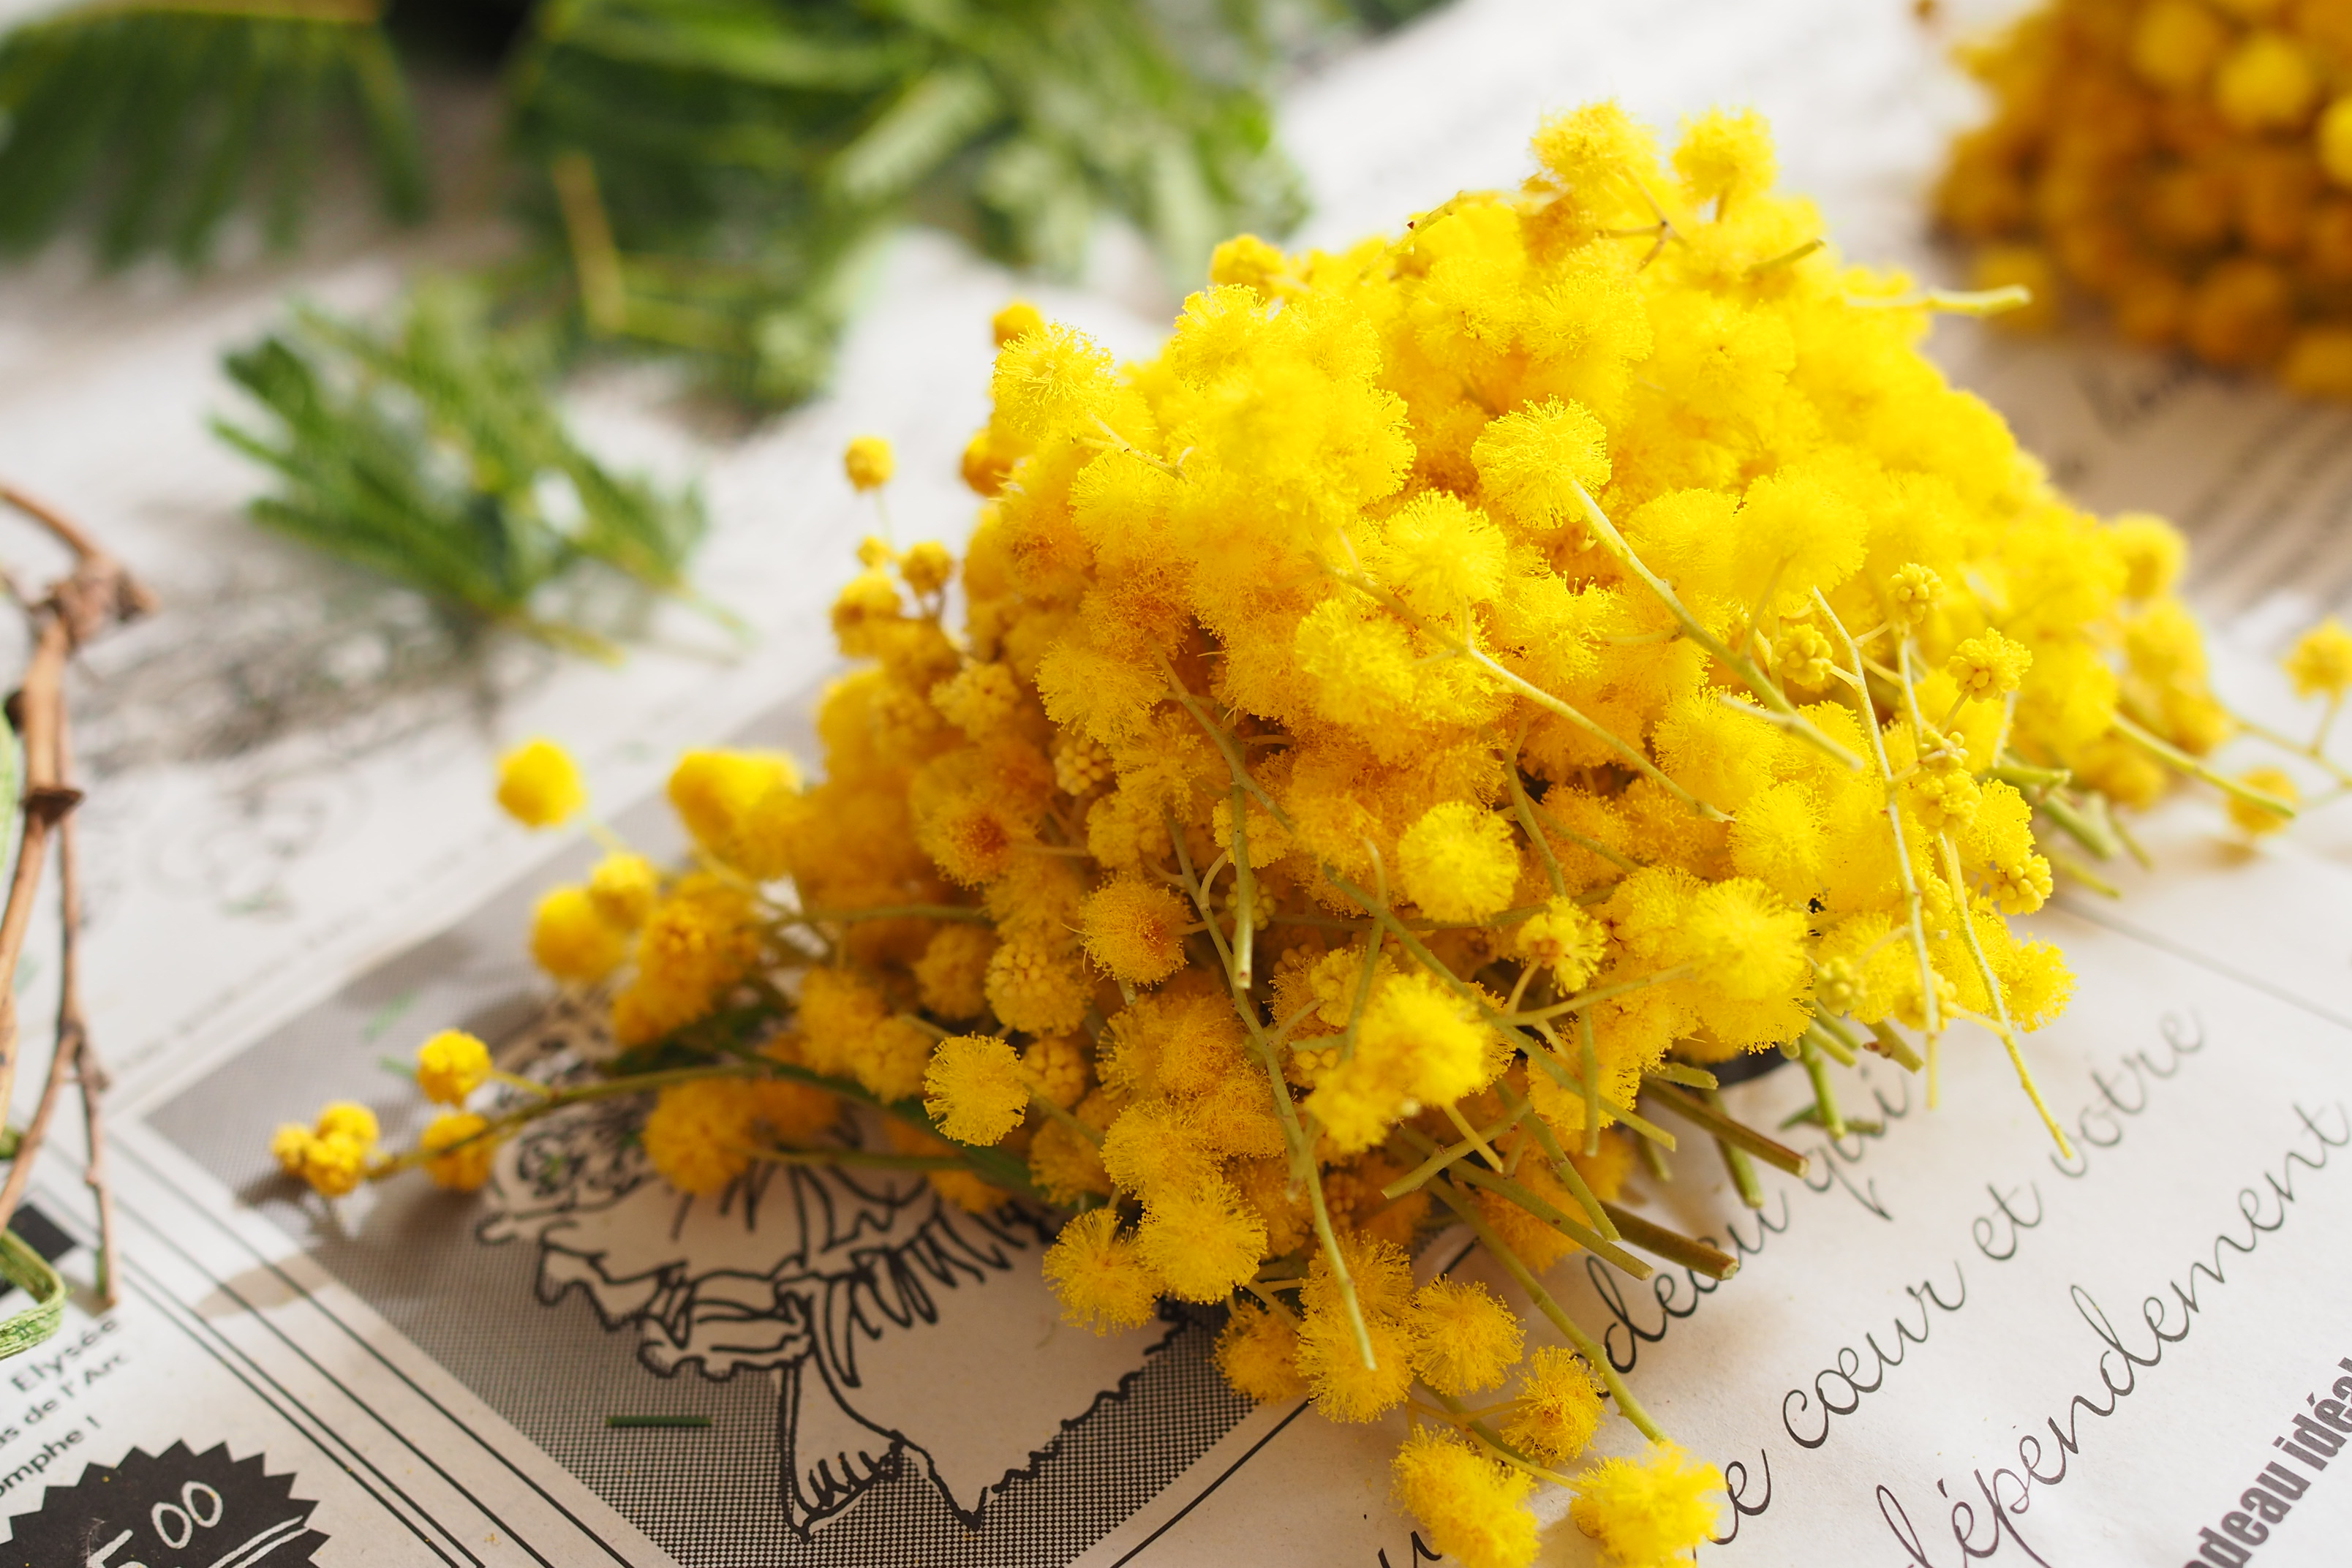 【GardenStory記事掲載】可愛さ&華やかさ満点のミモザをおしゃれに飾ろう